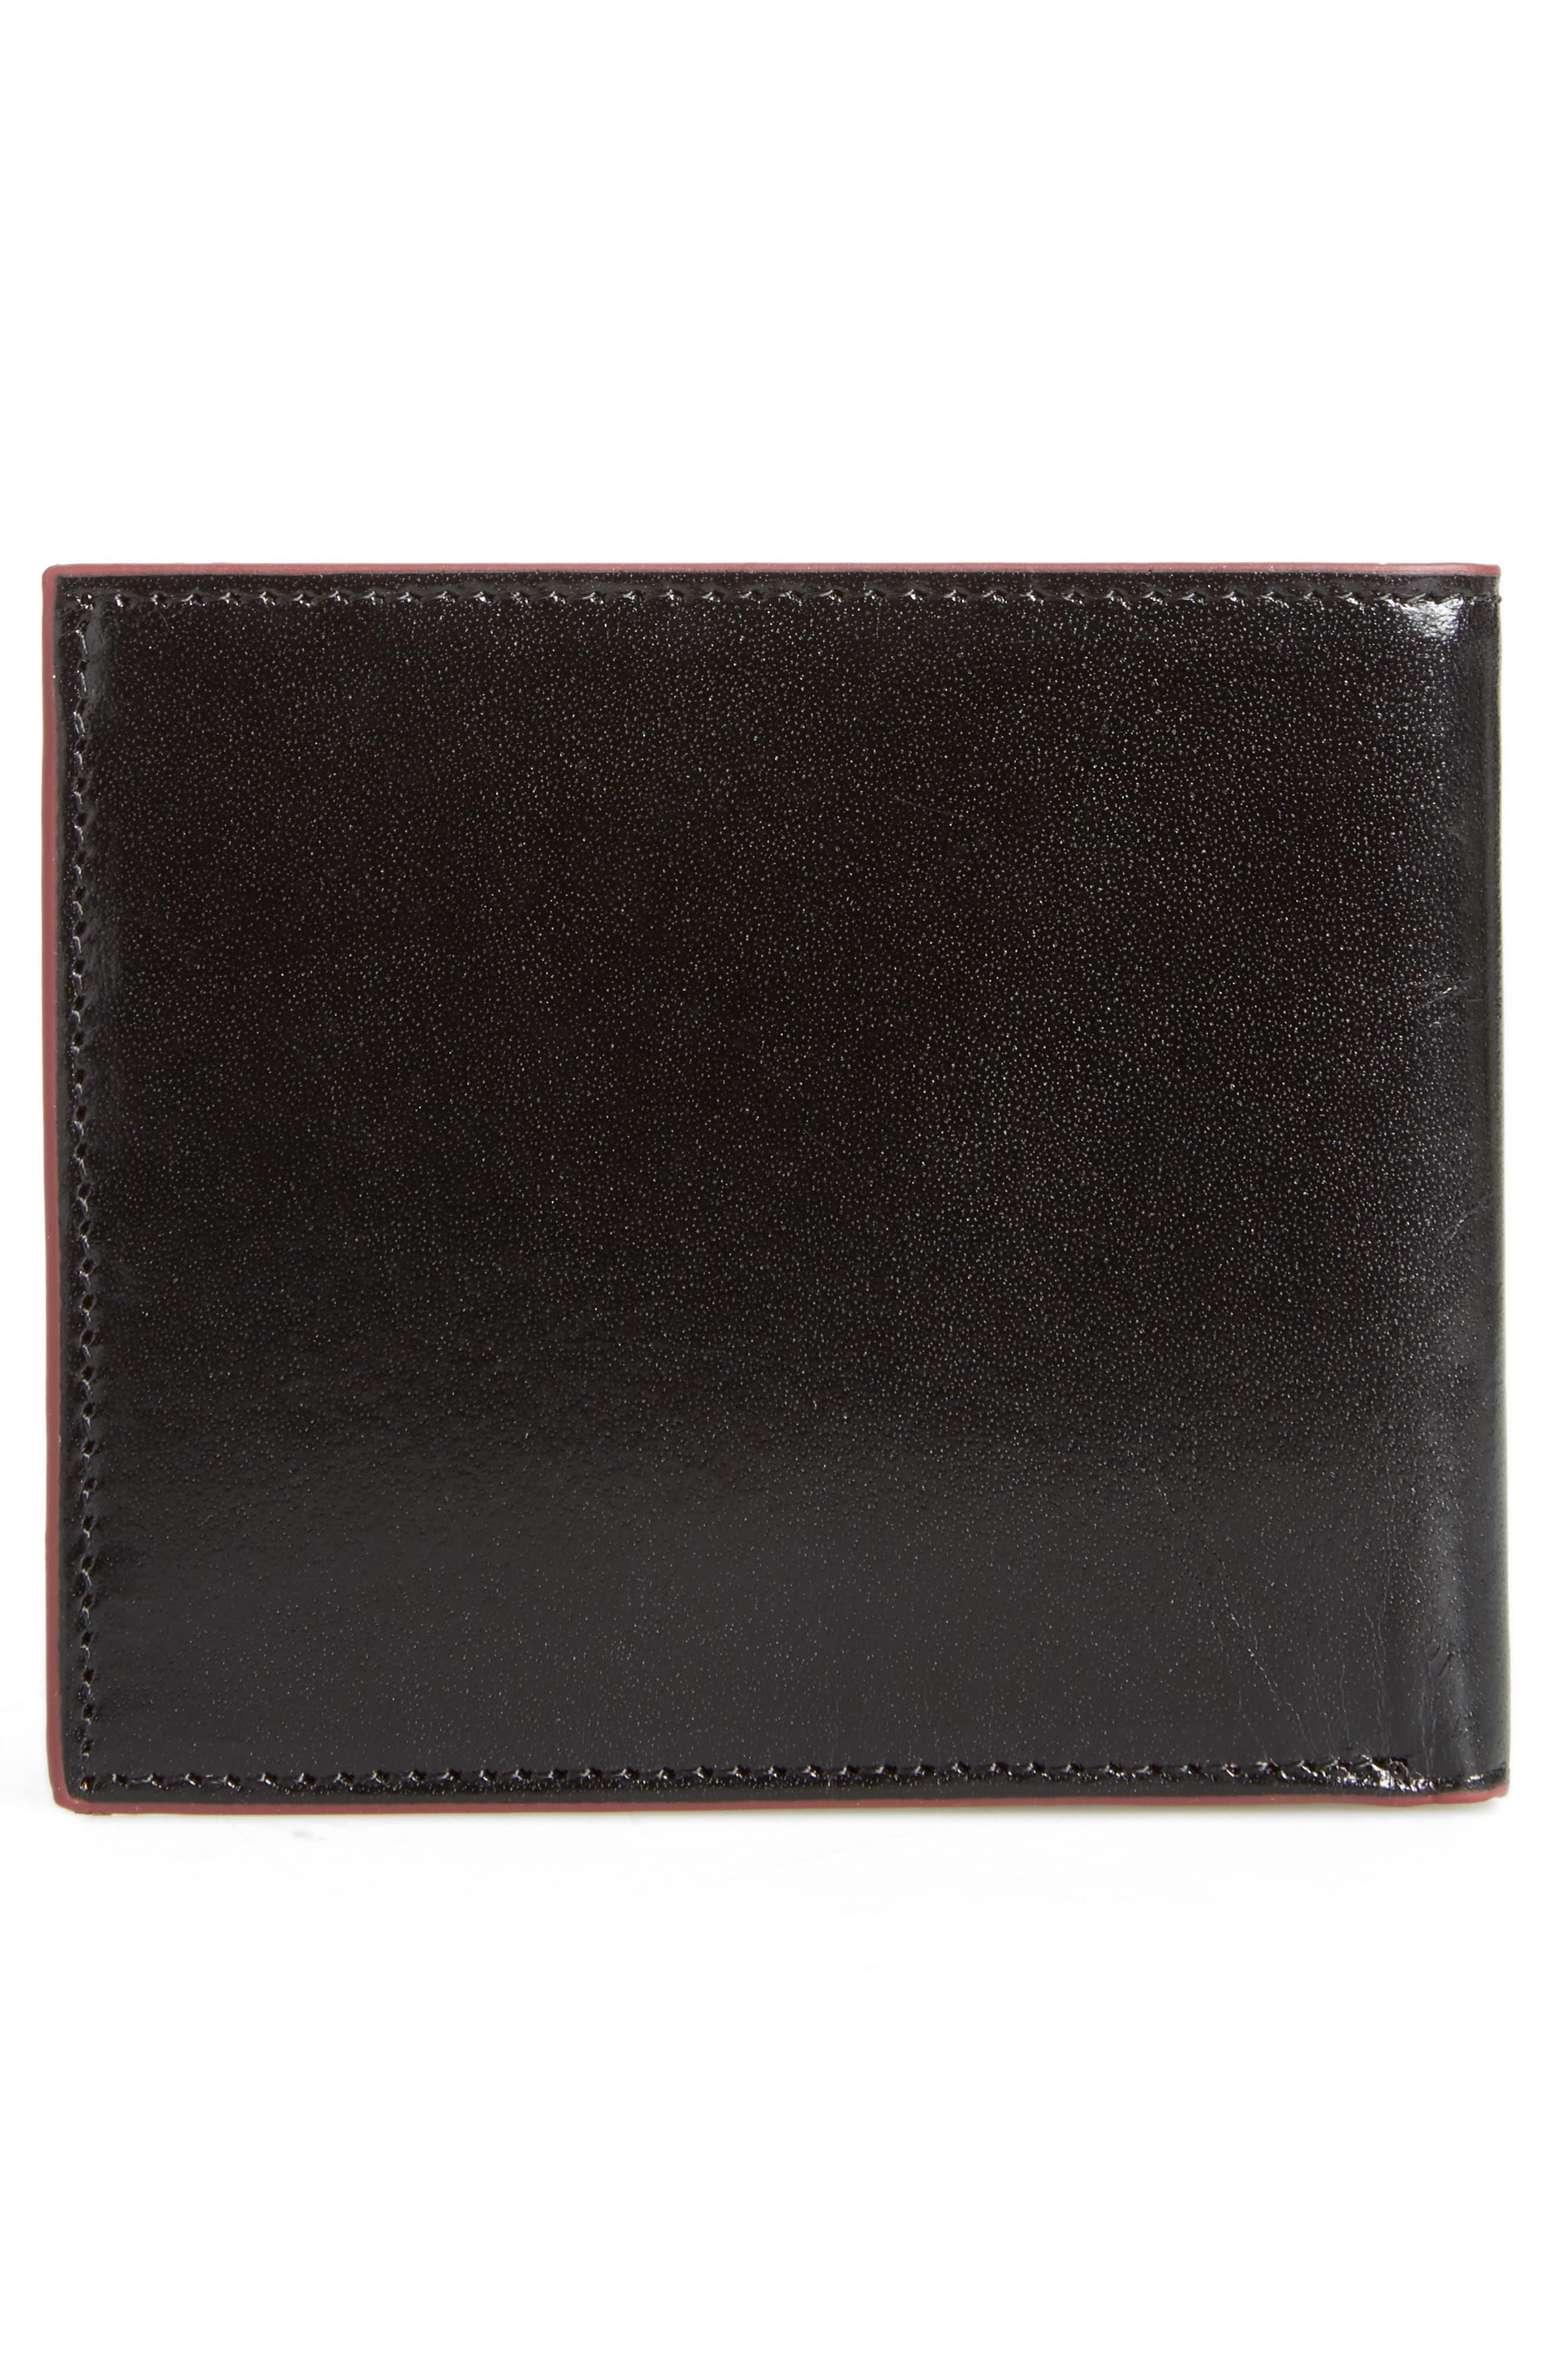 Loganz Leather Wallet,                             Alternate thumbnail 3, color,                             001